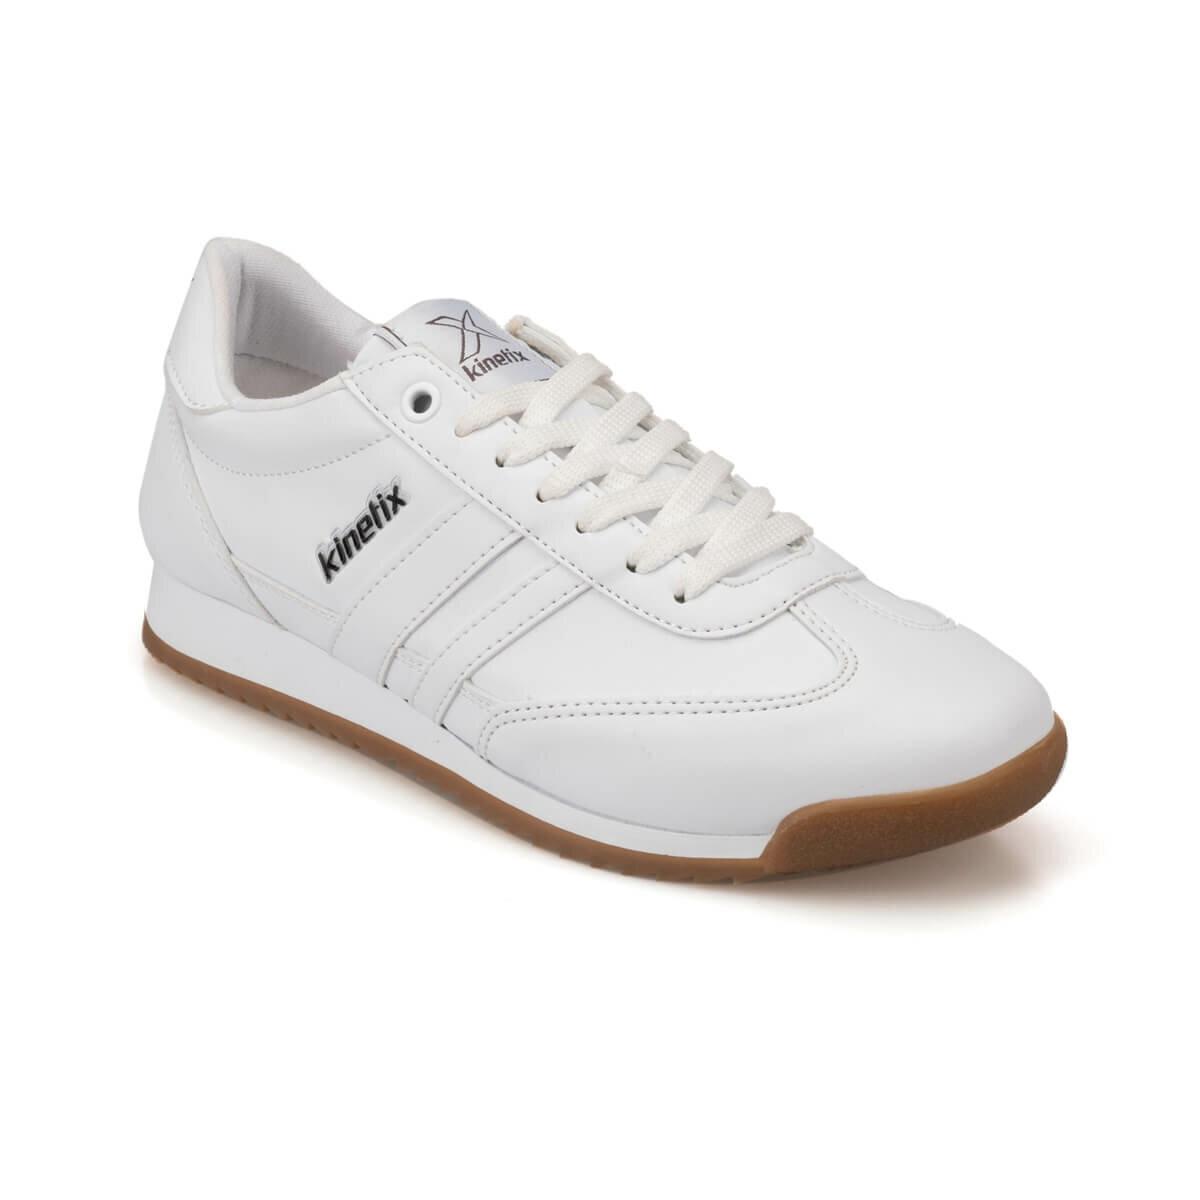 FLO HALLEY PU W 9PR White Women 'S Sneaker Shoes KINETIX